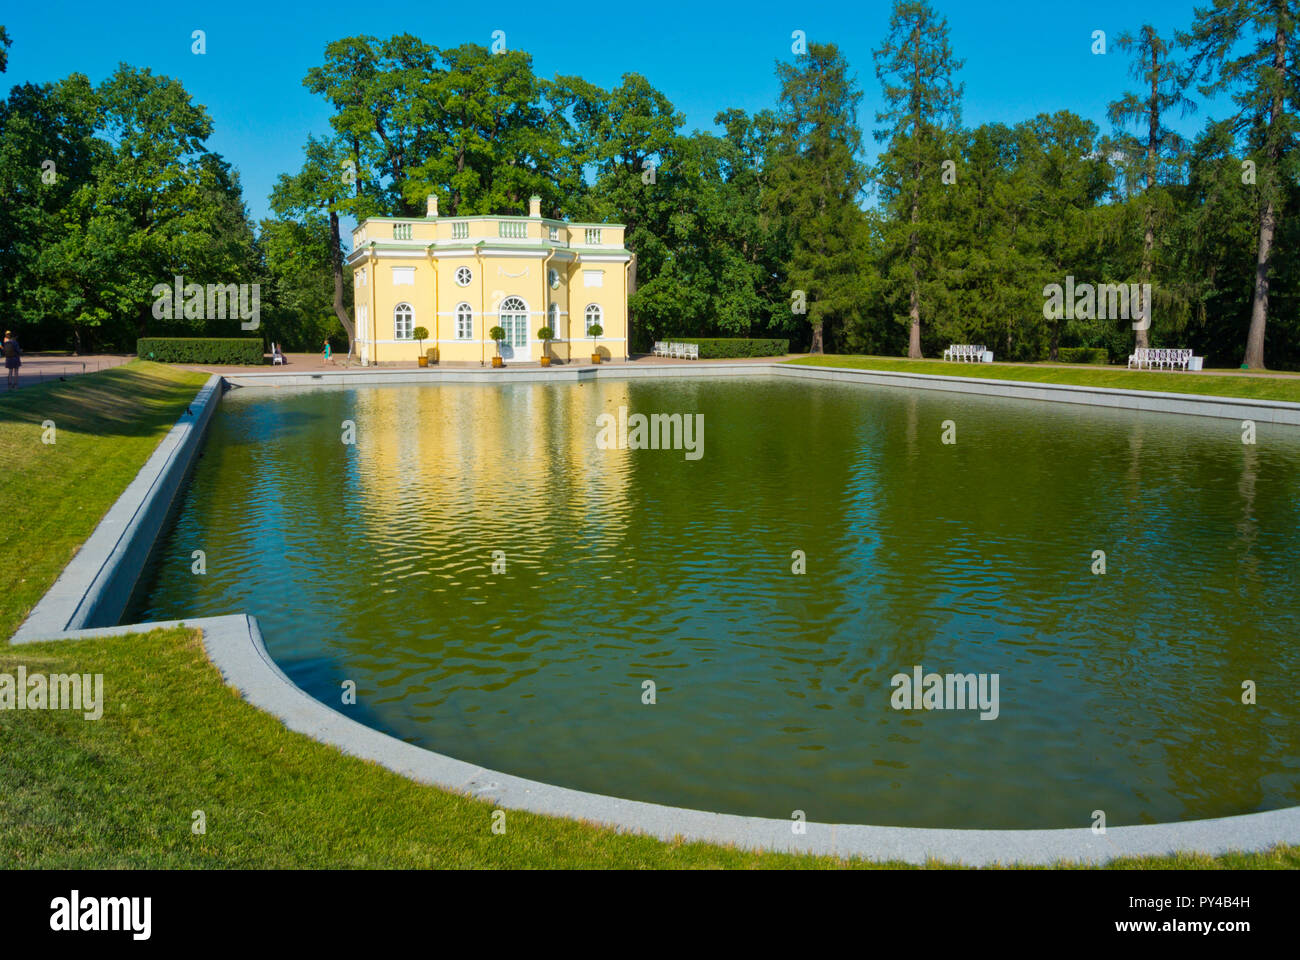 Upper Bathhouse, at Mirror Ponds, Catherine Park, Tsarskoye Selo, near Saint Petersburg, Russia - Stock Image